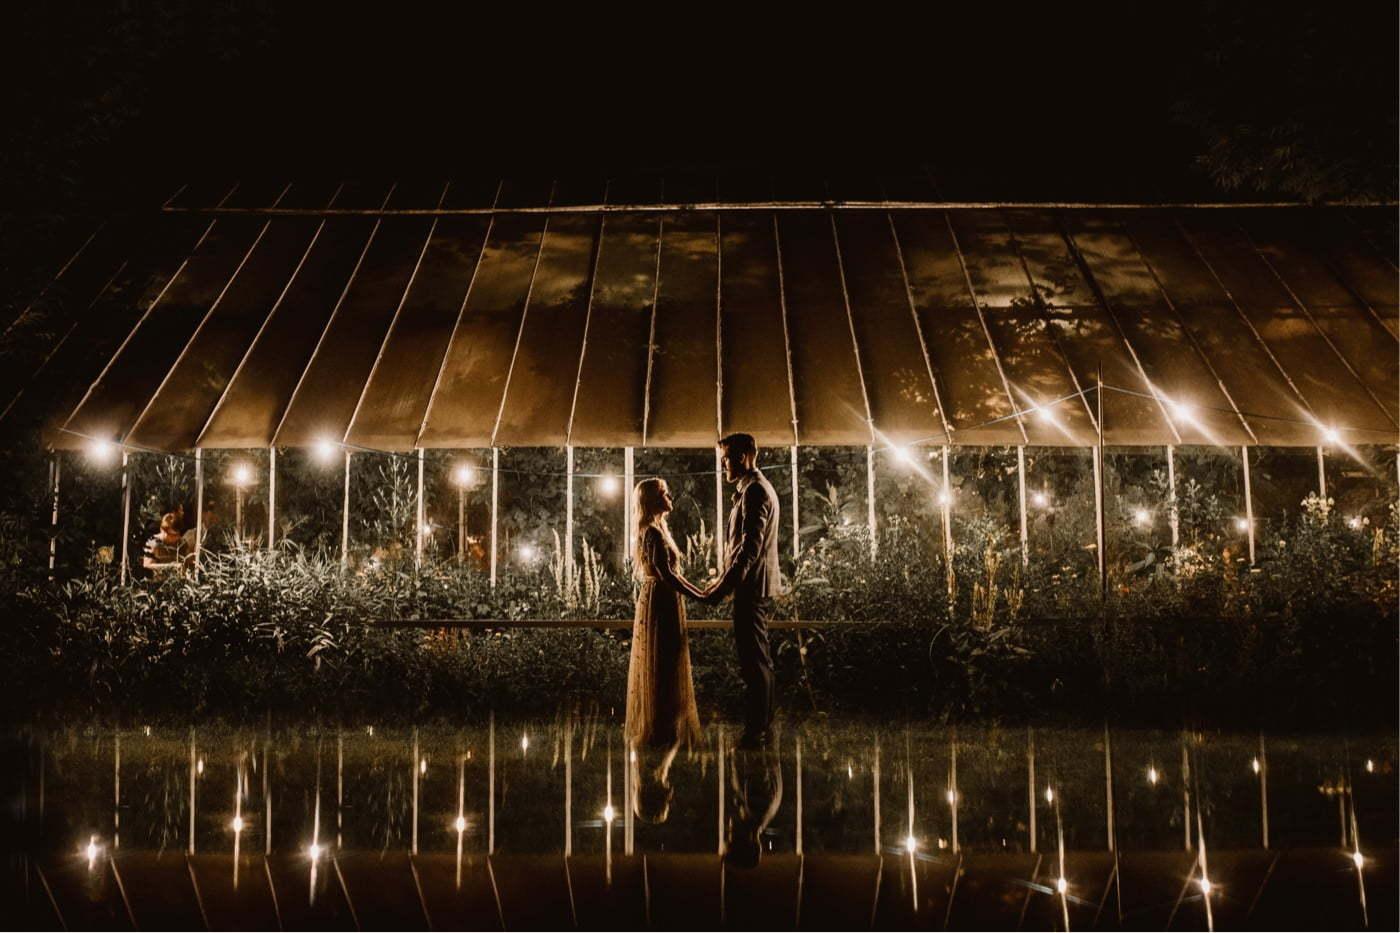 ewelina zieba rustykalne wesele stara oranzeria warszawa 089